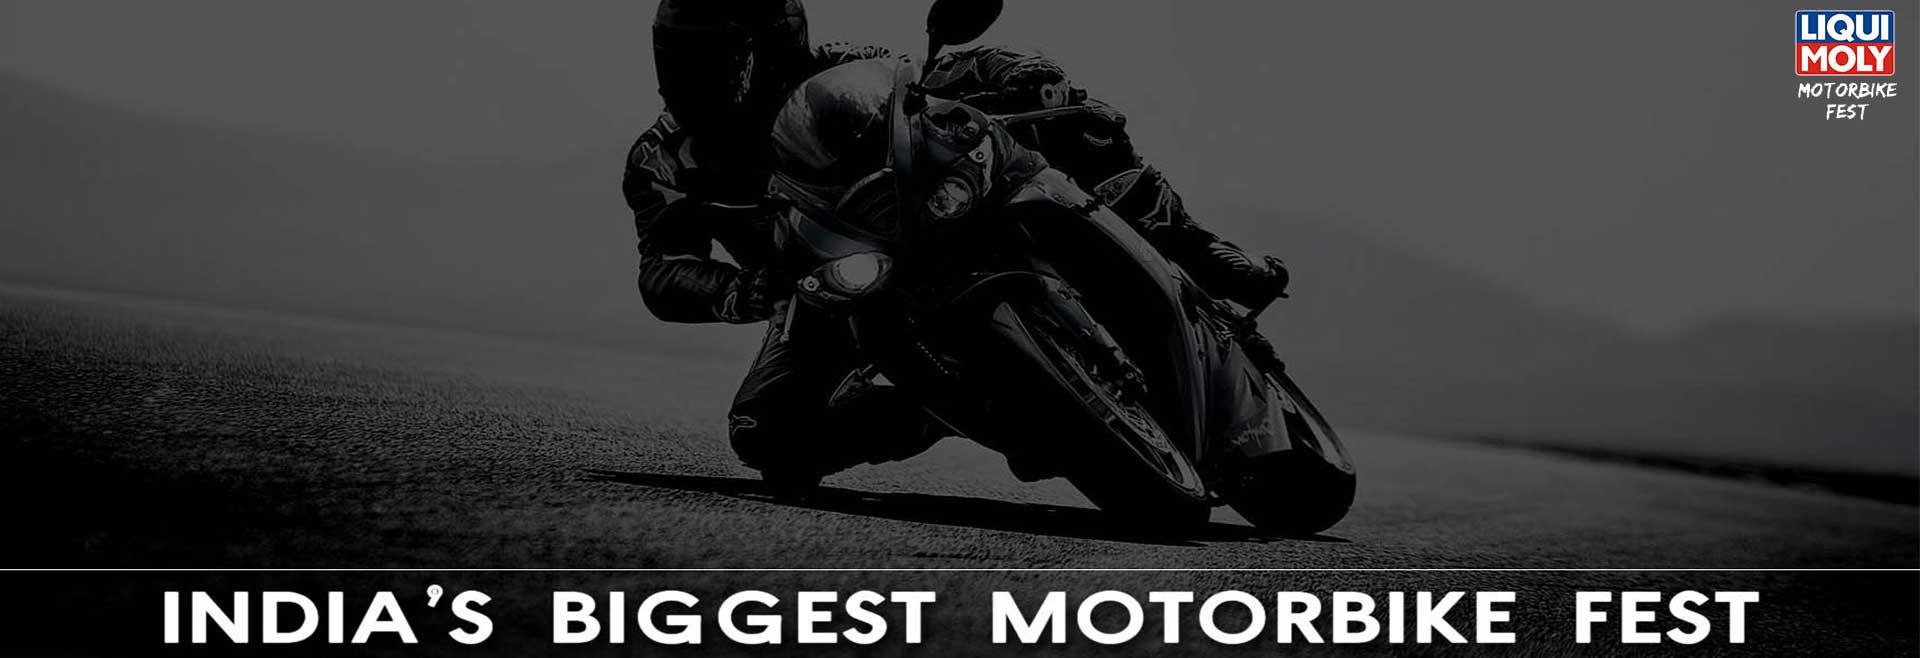 Liqui Moly Motorbike Fest